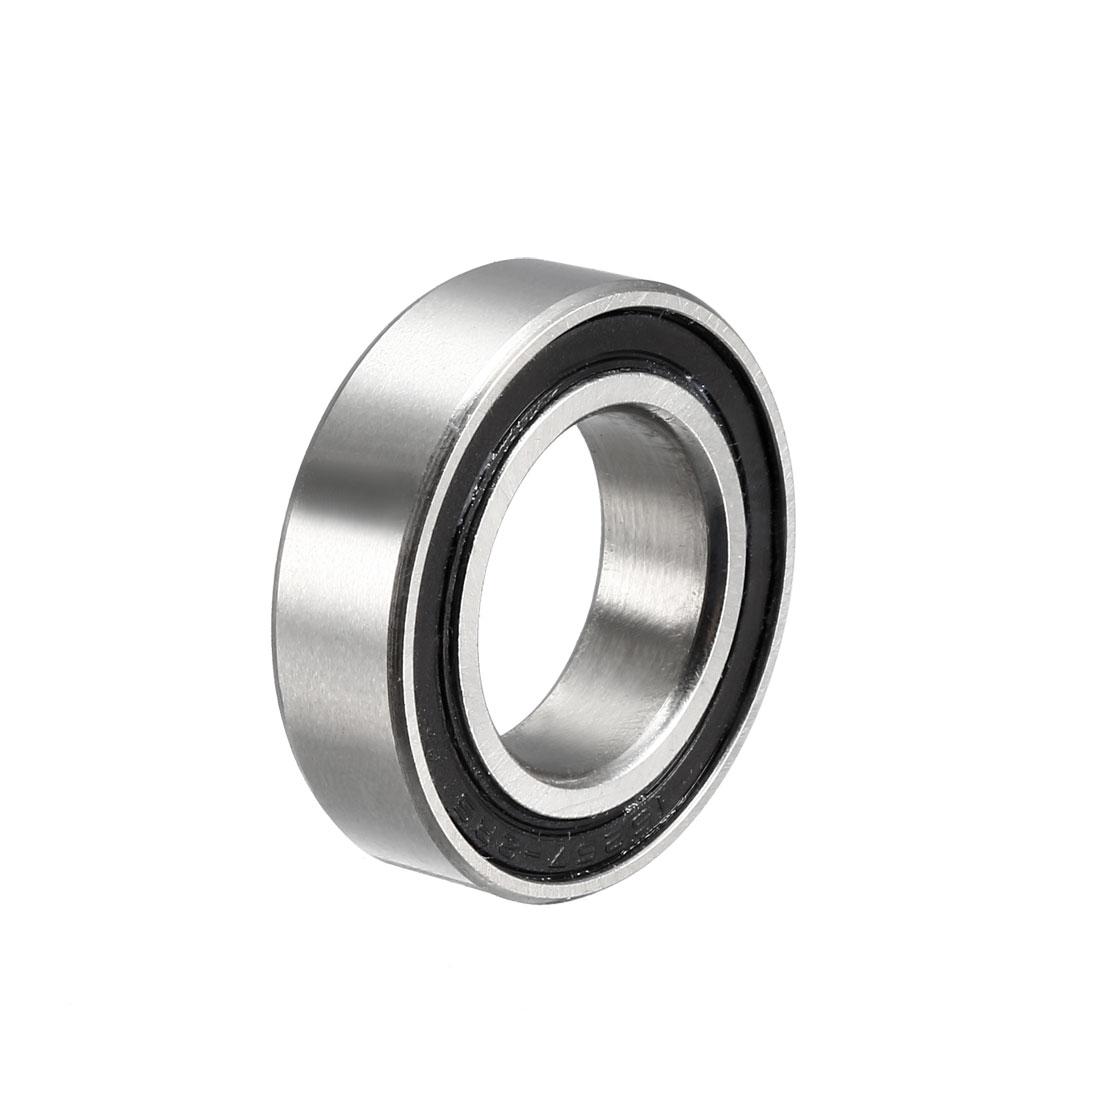 MR15267-2RS Deep Groove Ball Bearing 15x26x7mm Double Sealed Chrome Bearings